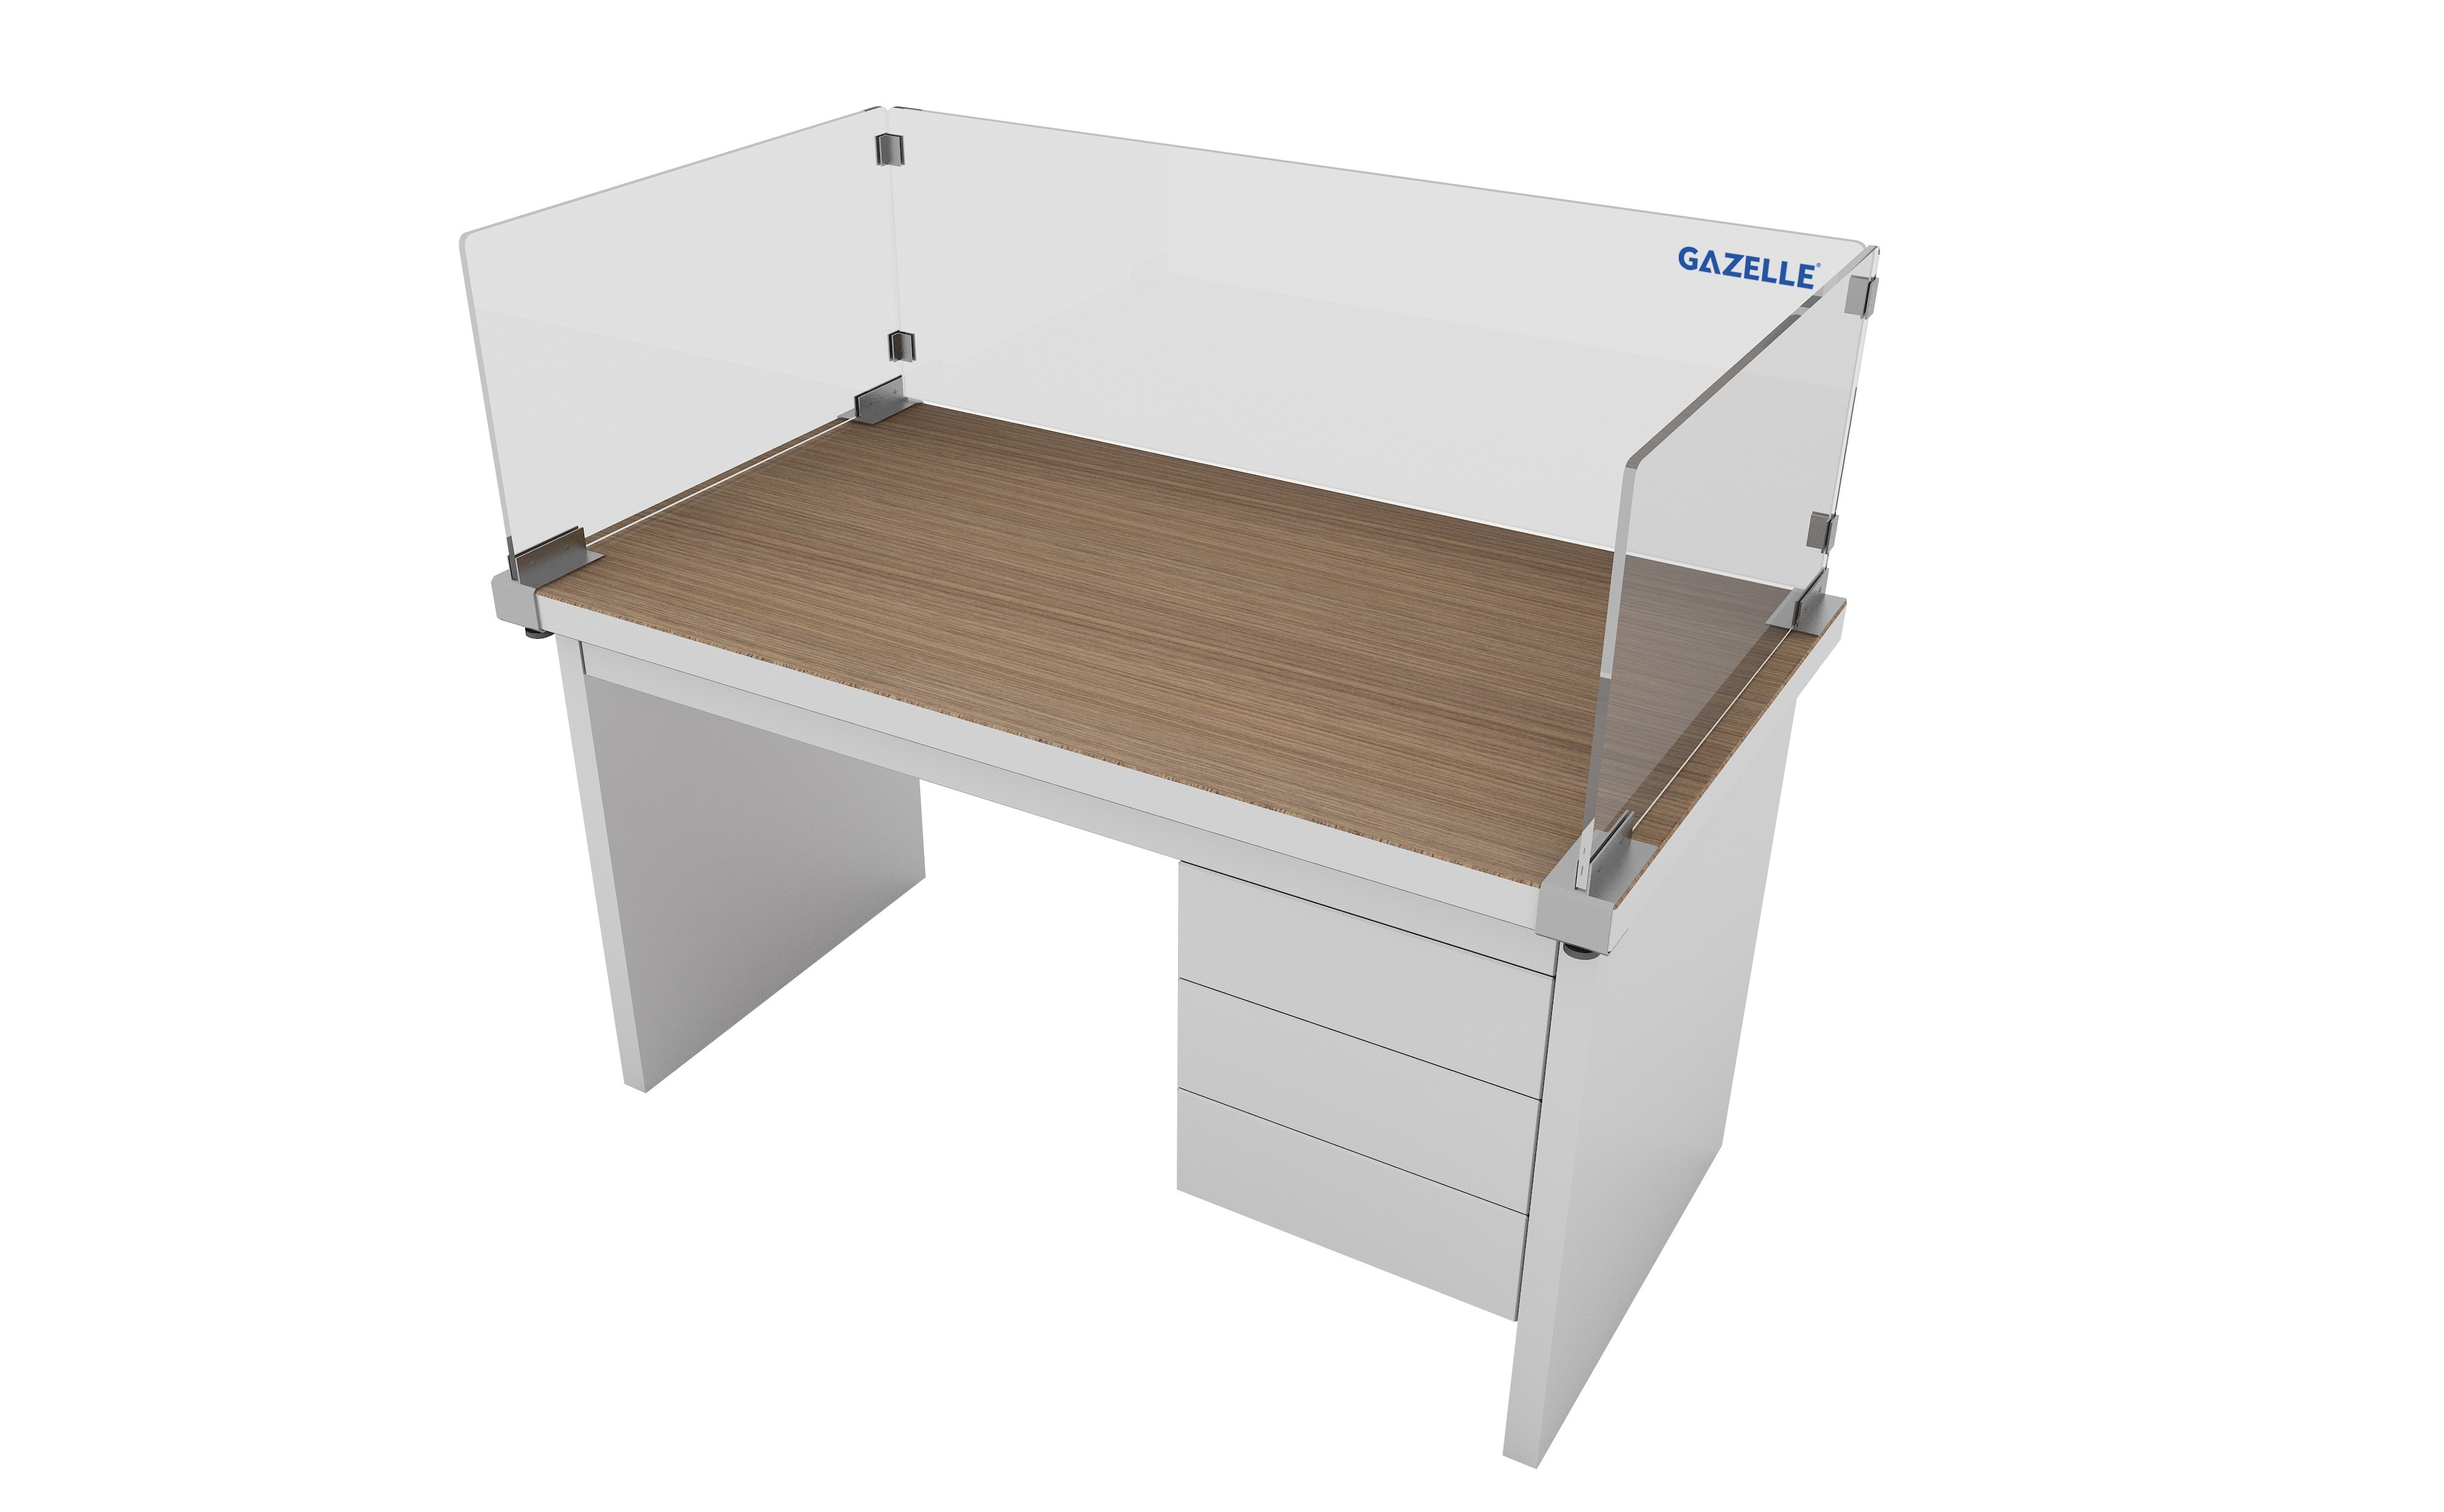 Gazelle_G9613 - 3Sided Enclosure Desk Partition